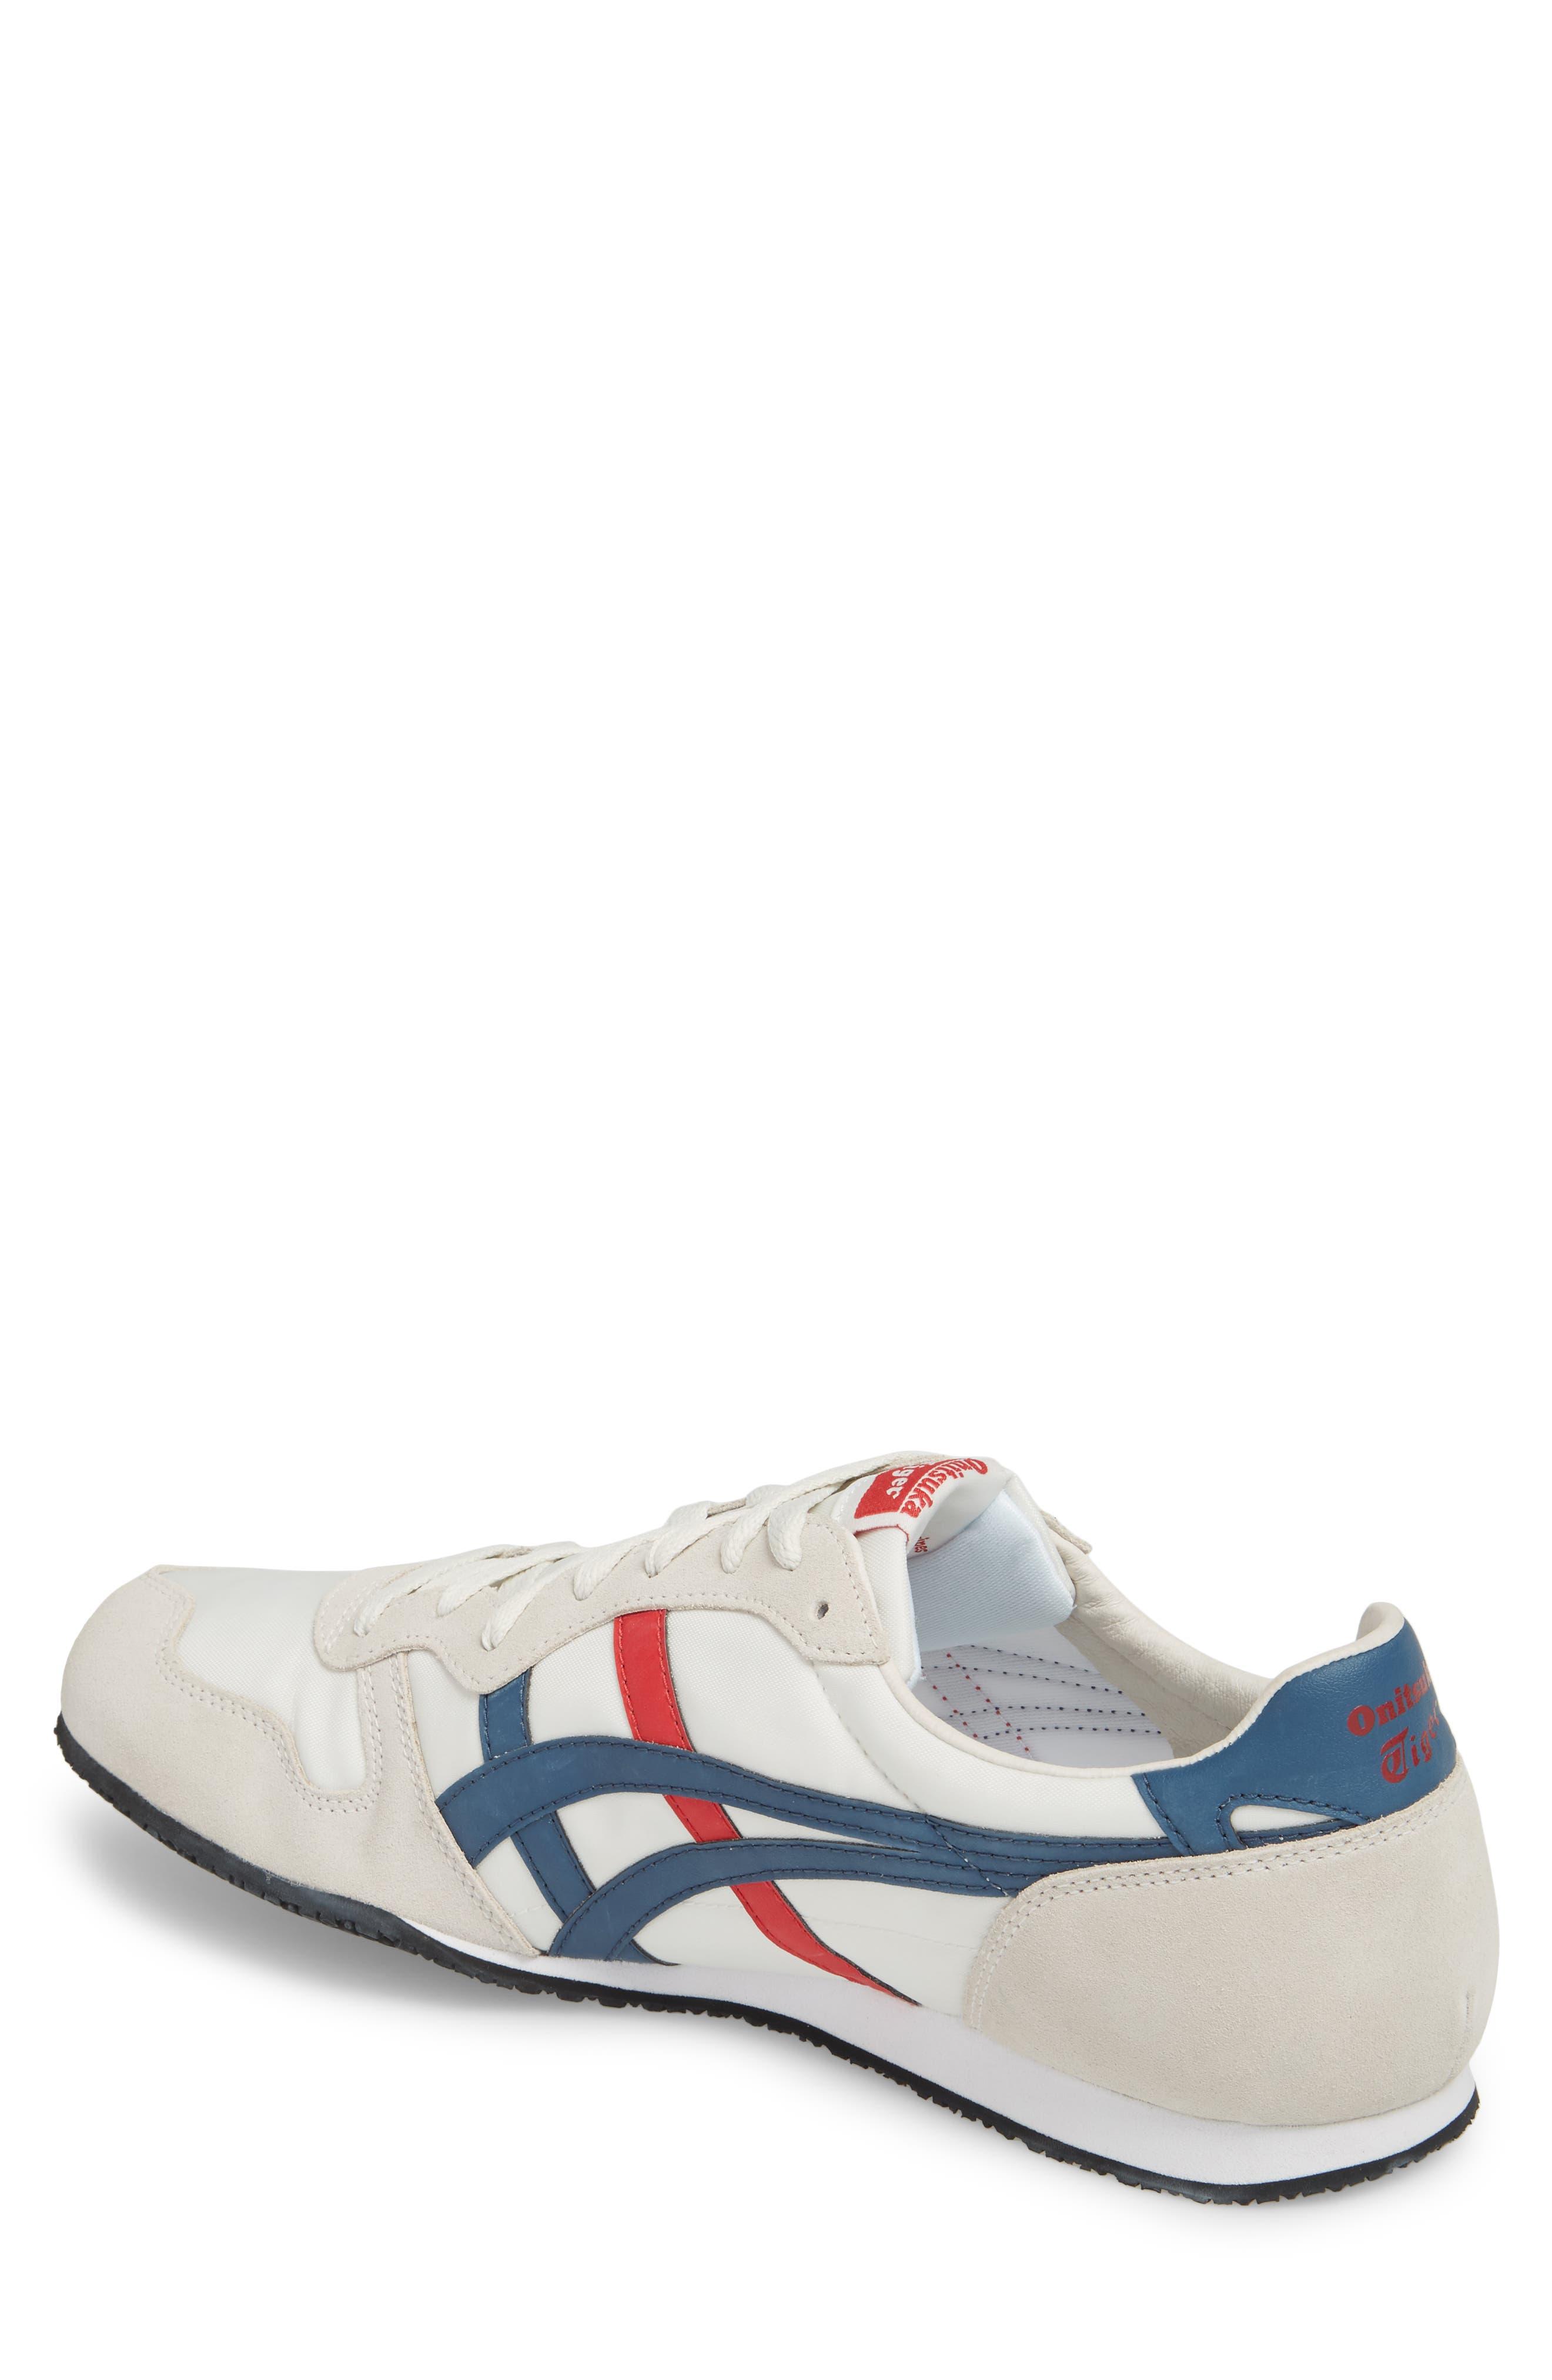 'Serrano' Sneaker,                             Alternate thumbnail 2, color,                             White/ Mallard Blue